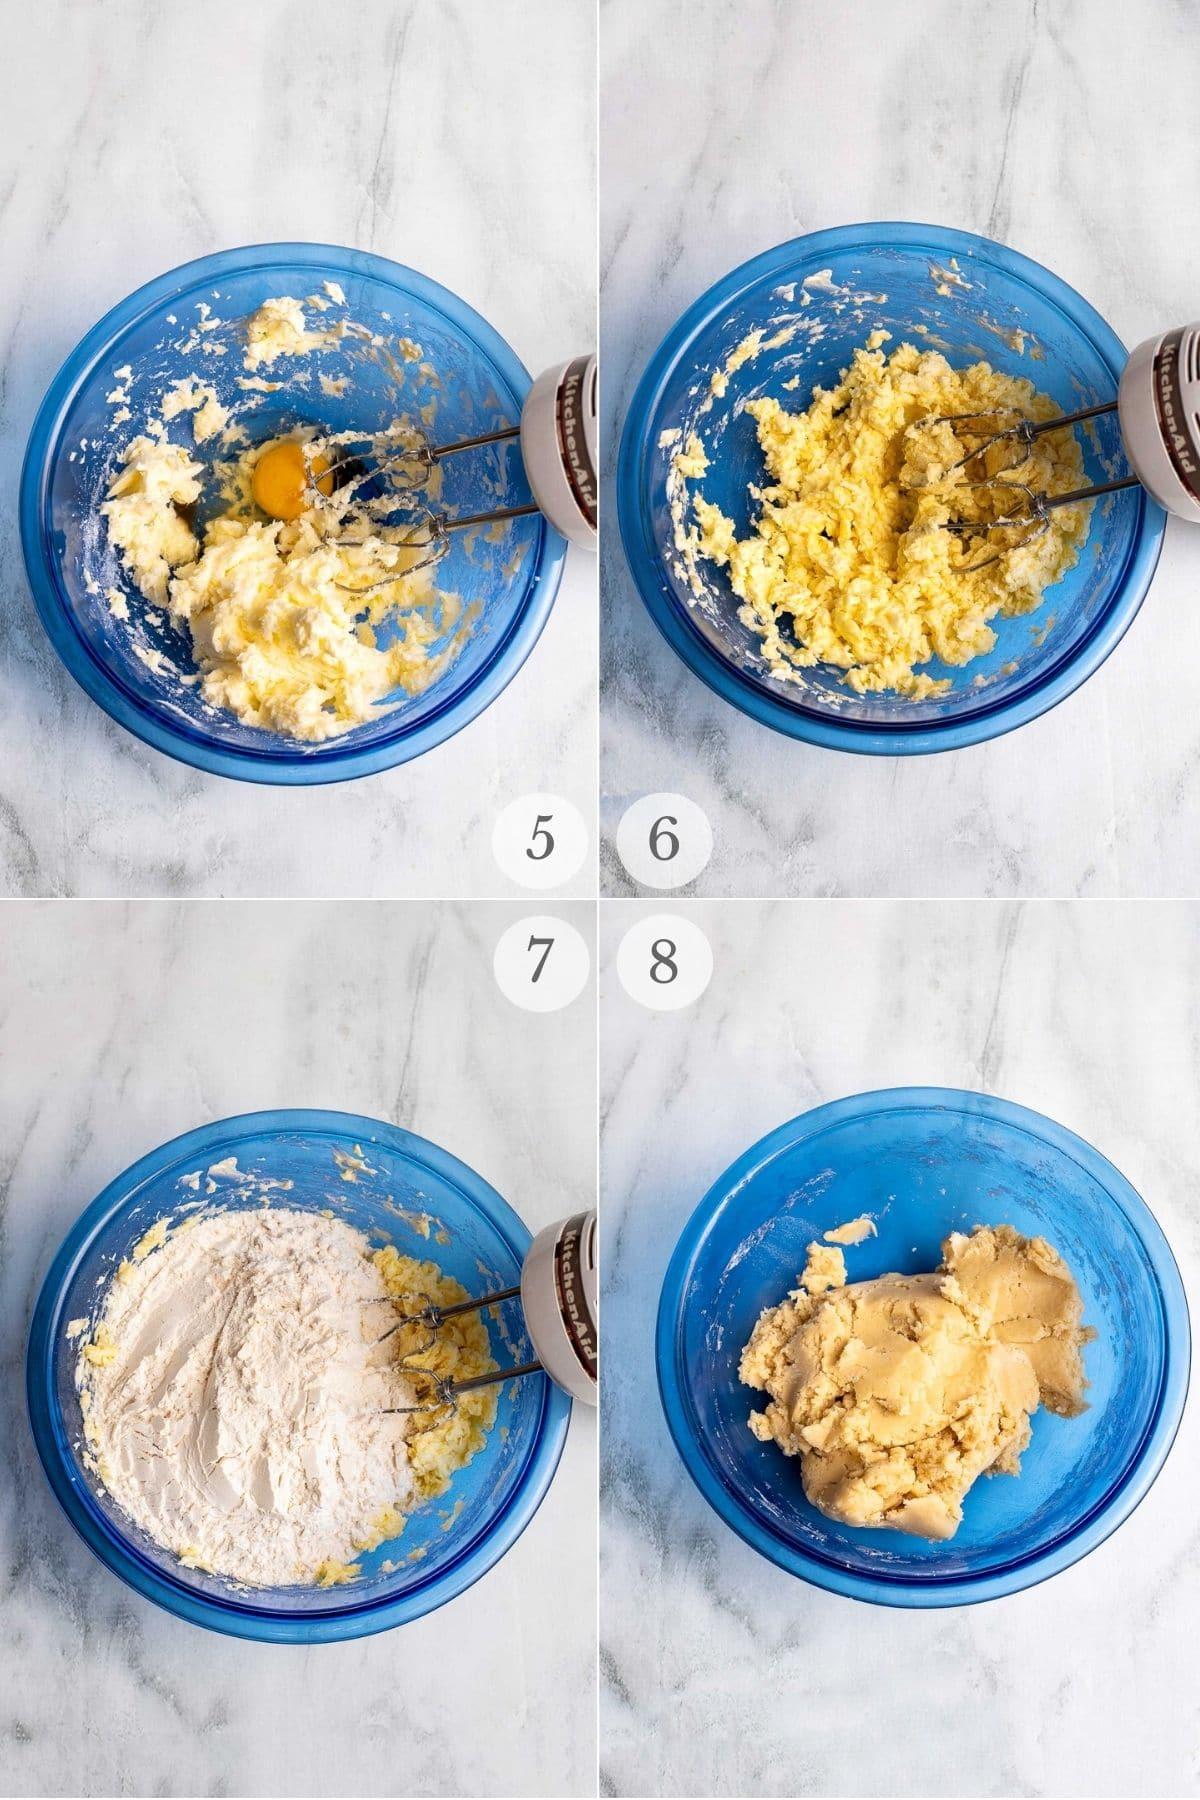 butter cookies recipe steps 5-8